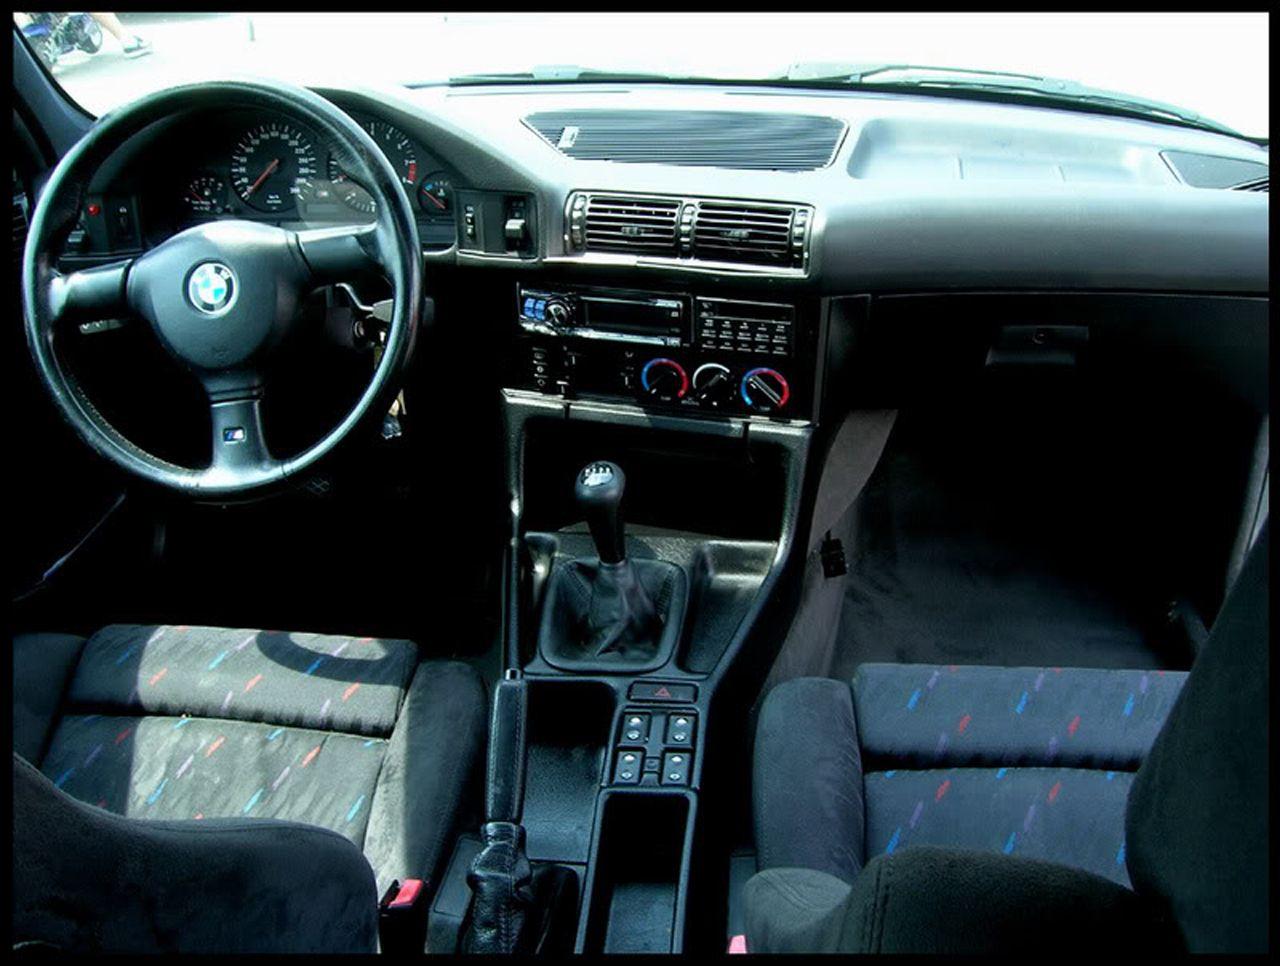 BMW 3 Series bmw m5 1990 1990 BMW M5 interior | E34 BMW | Pinterest | BMW M5 and BMW